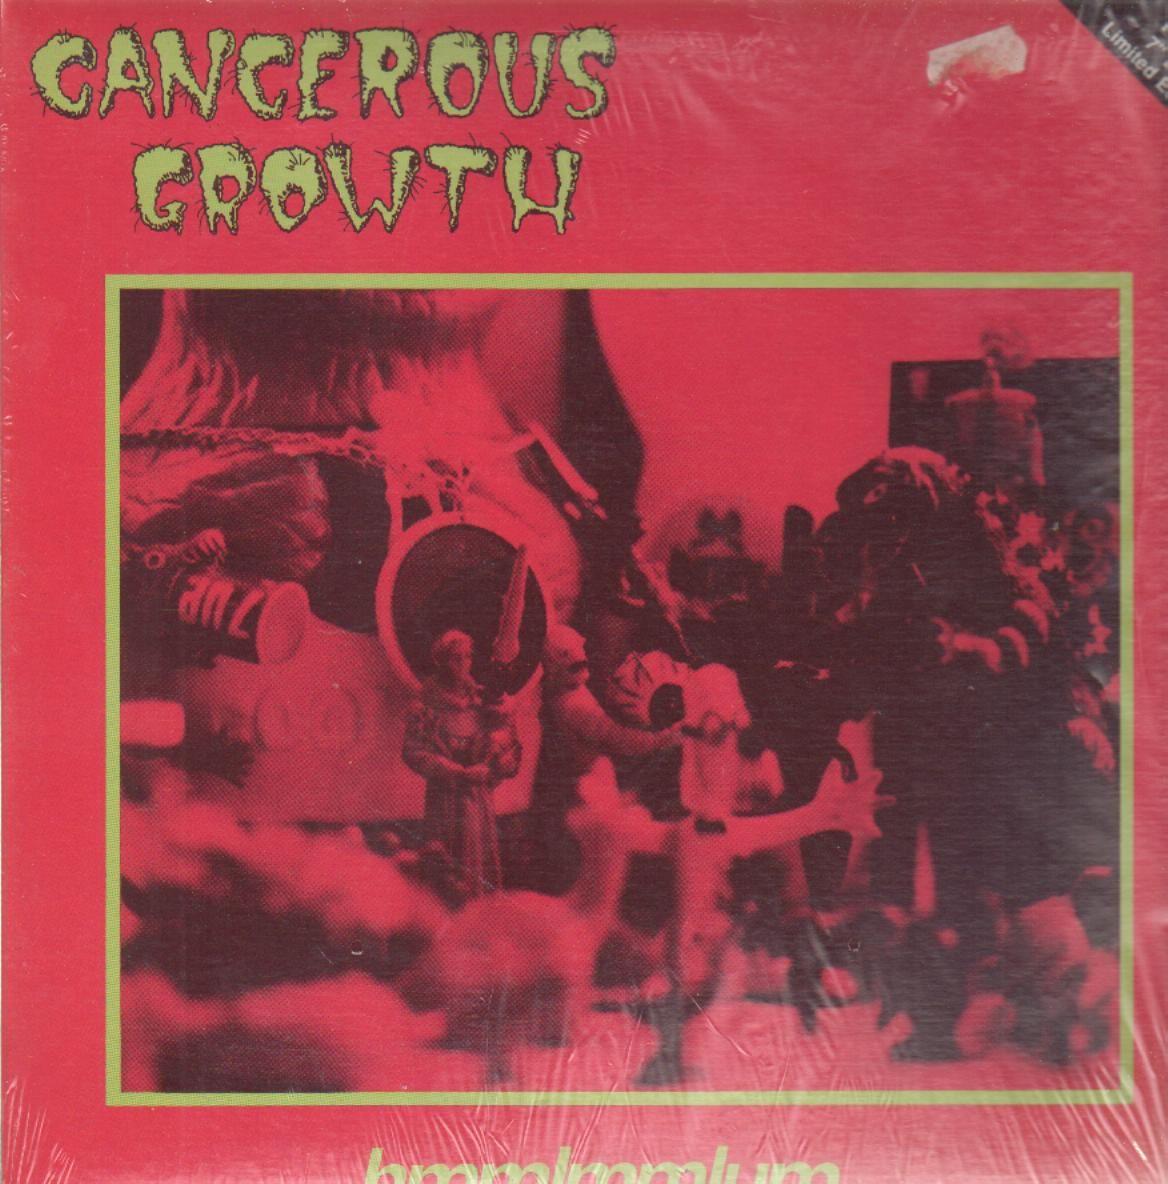 Cancerous Growth - Hmmlmmlum... 1987